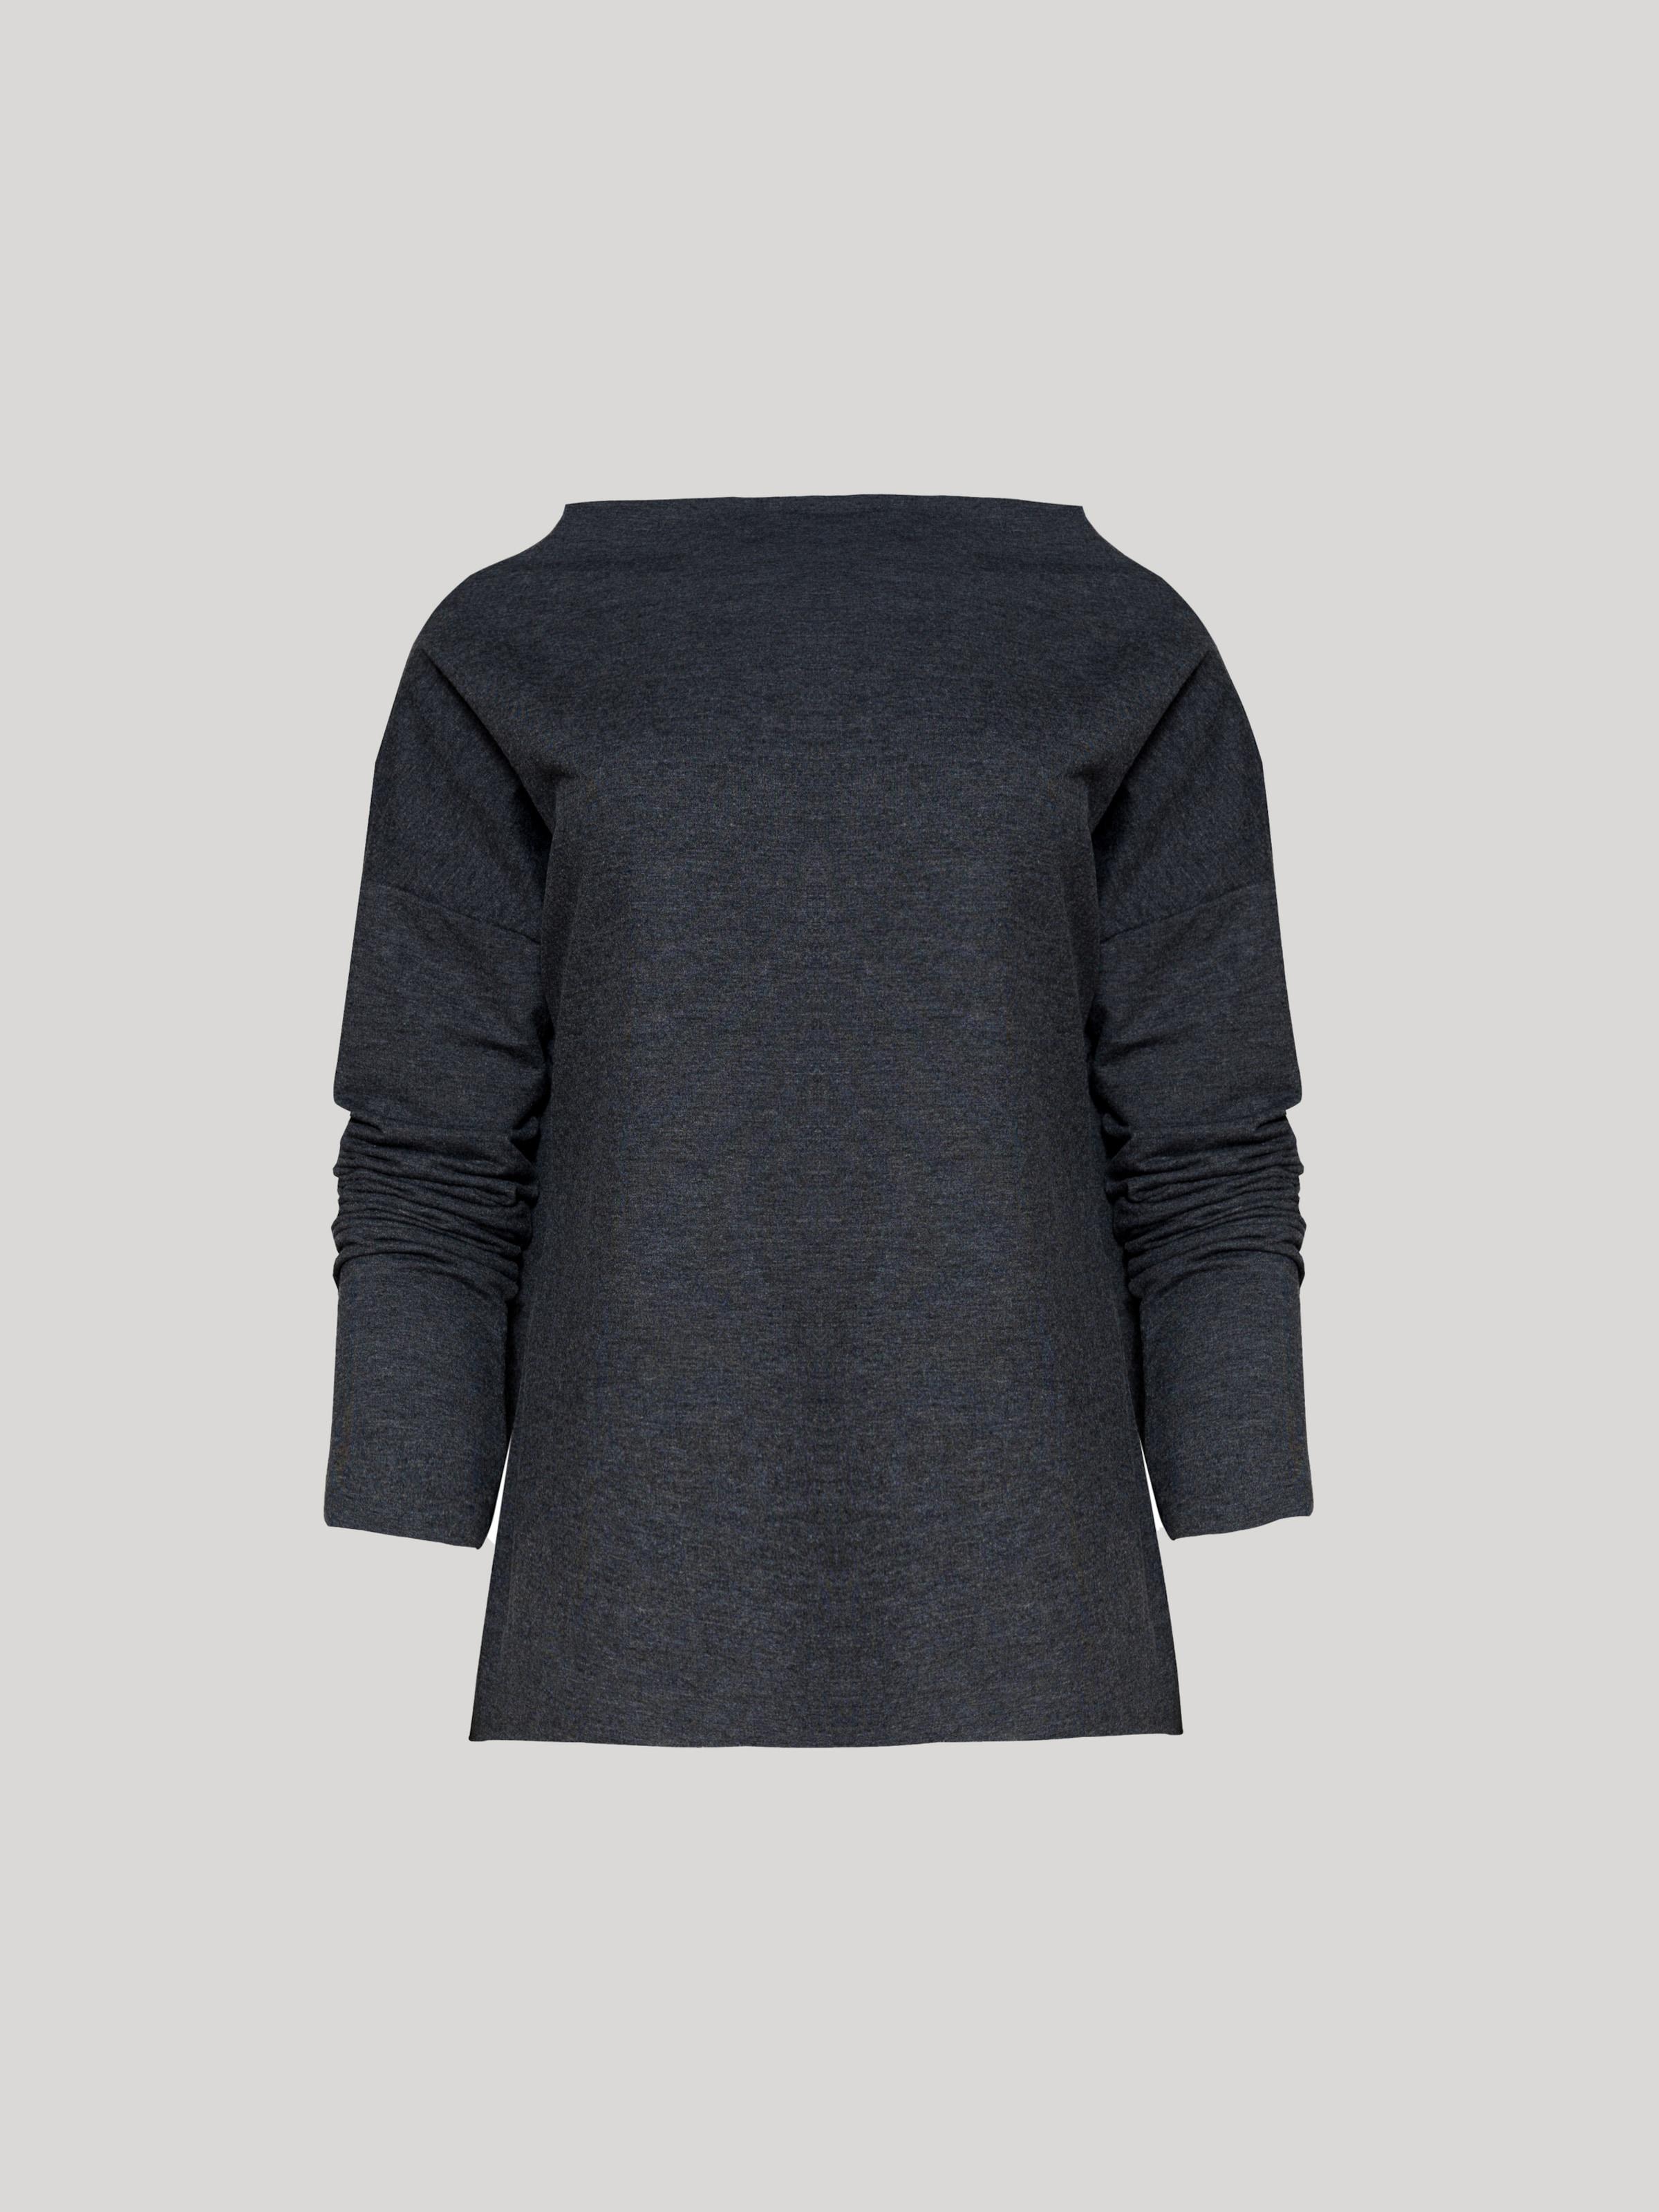 In Usha Shirt Dunkelgrau Usha Shirt Usha In Dunkelgrau Dunkelgrau Shirt In Usha 1JFKlc